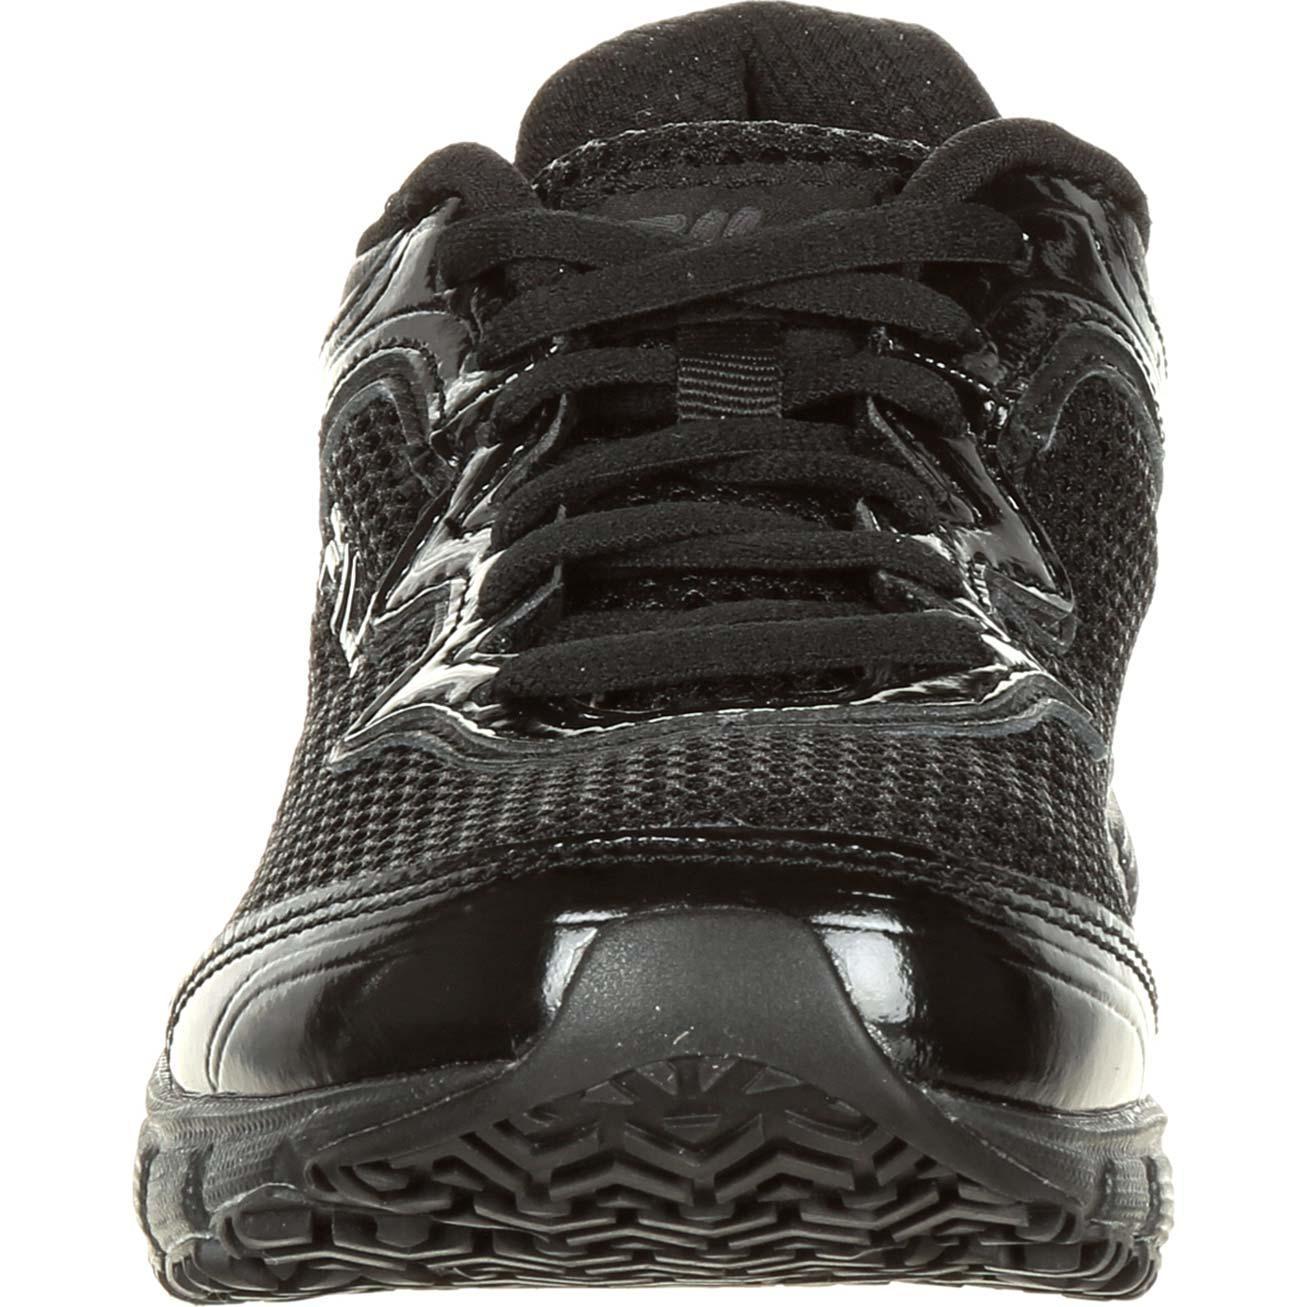 7761a902c86f Loading zoom. Fila Memory Fresh Start Women s Slip-Resistant Work Athletic  Shoe